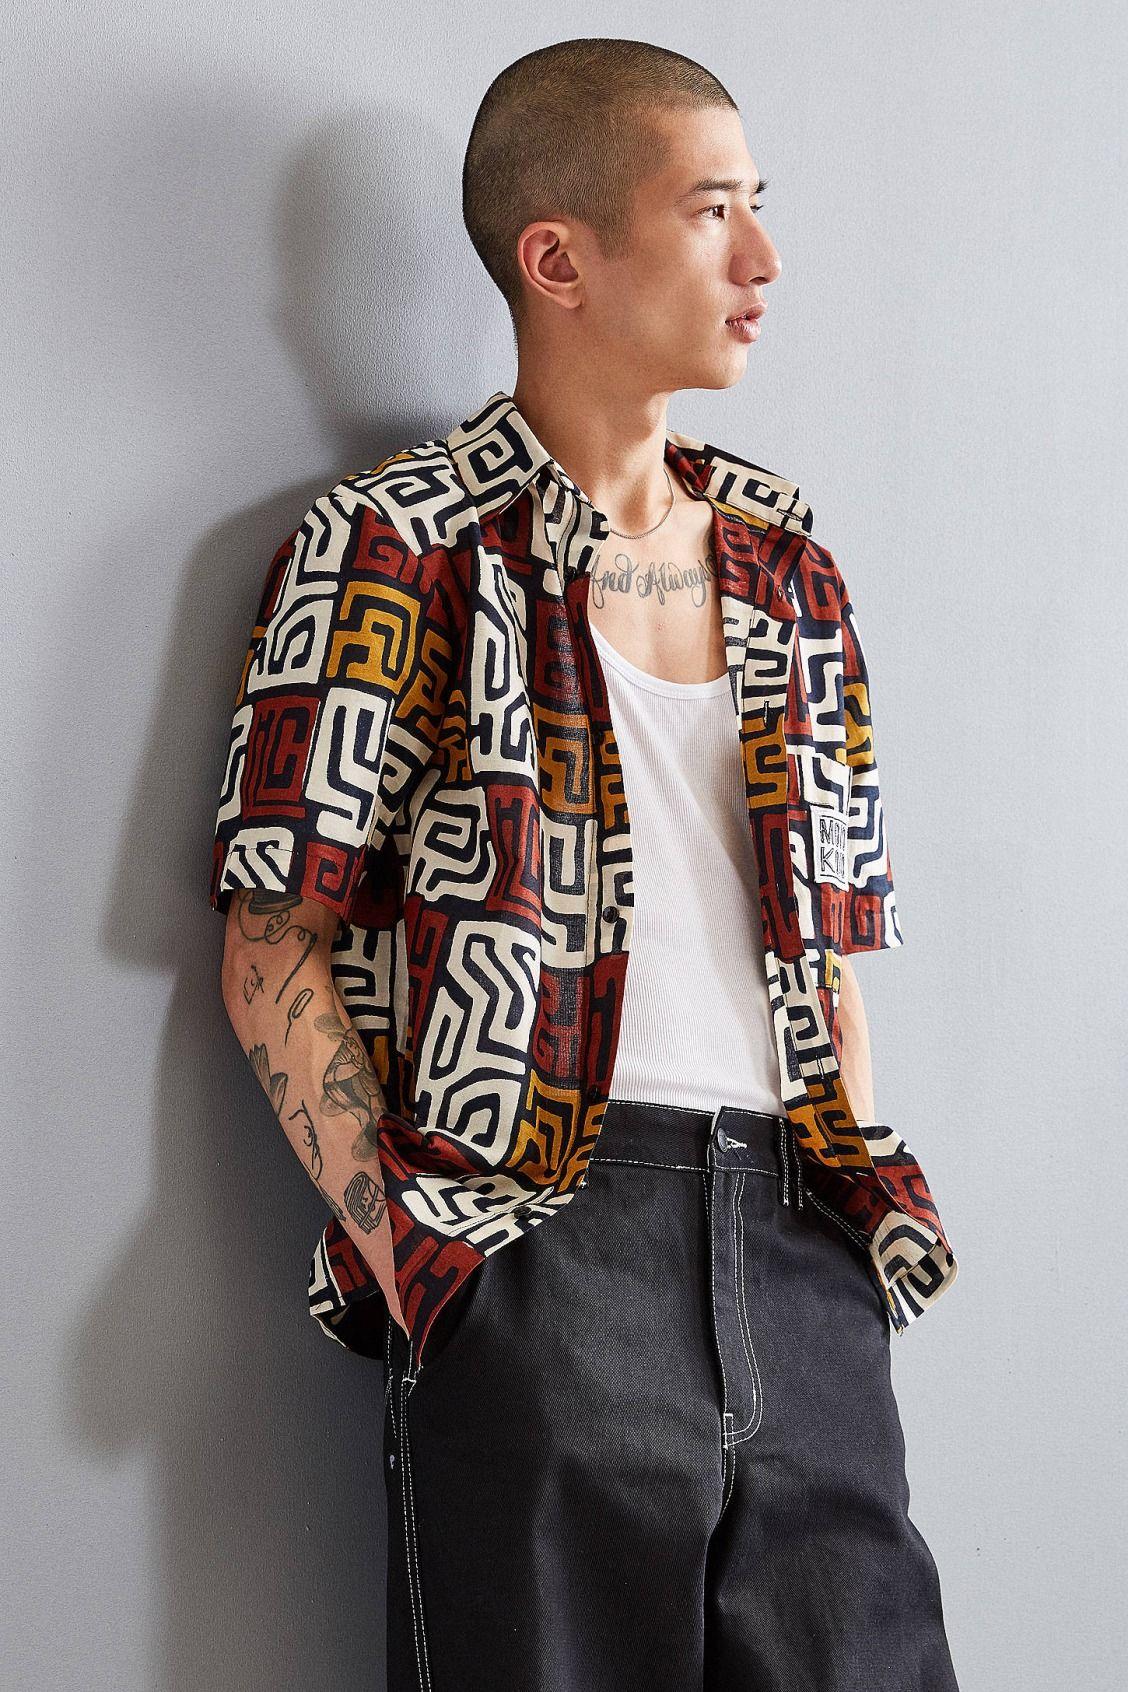 Flannel shirt with shorts  Mojo Kojo Maz Print Short Sleeve ButtonDown Shirt  New Arrivals